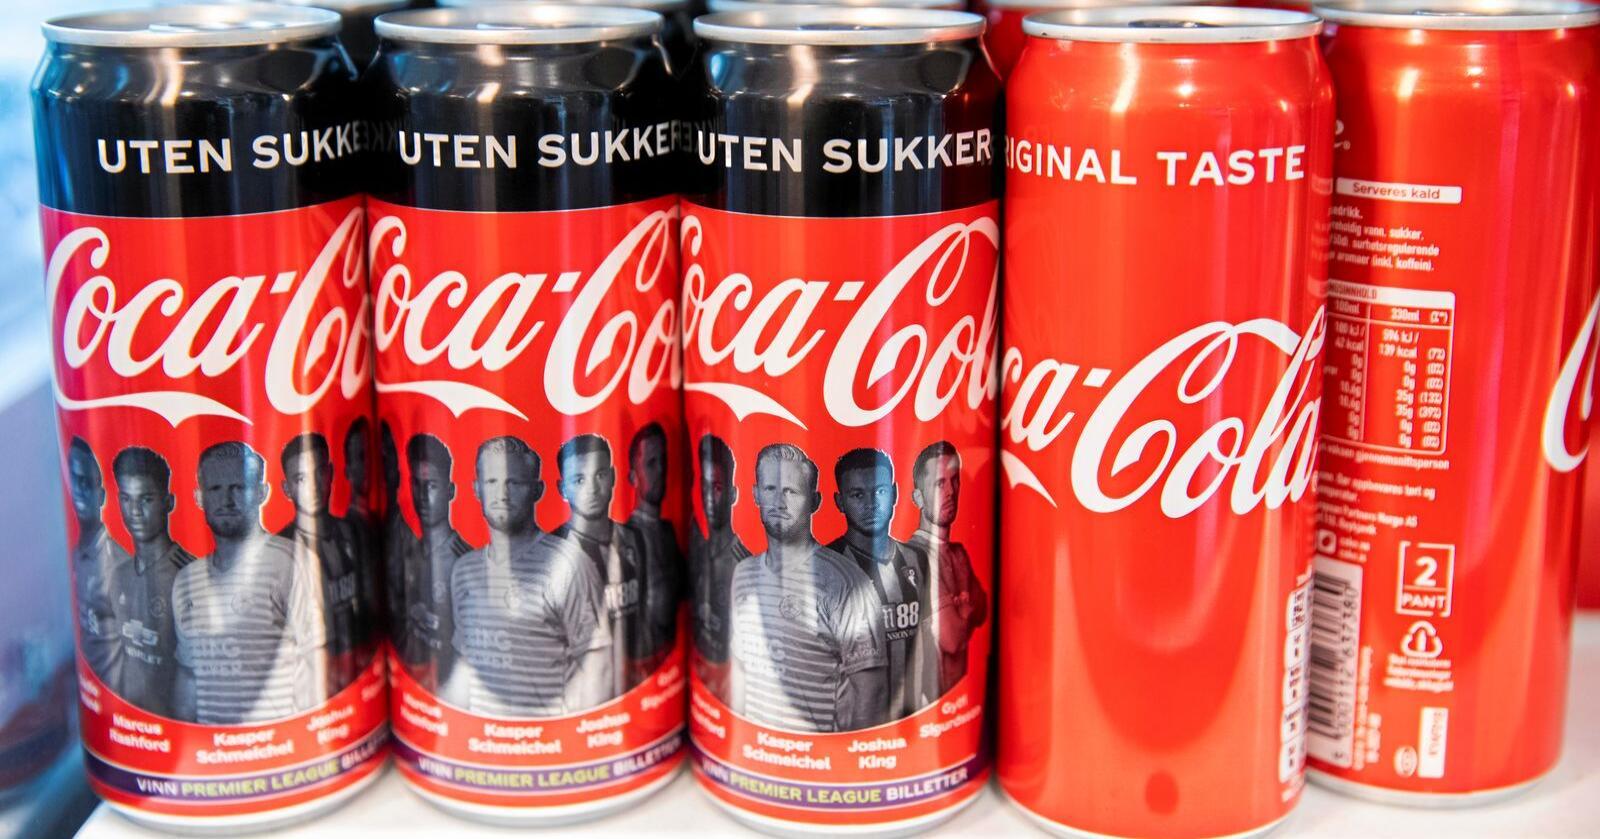 Norge er det landet i Europa hvor flest velger sukkerfri brus. Foto: Berit Roald / NTB scanpix